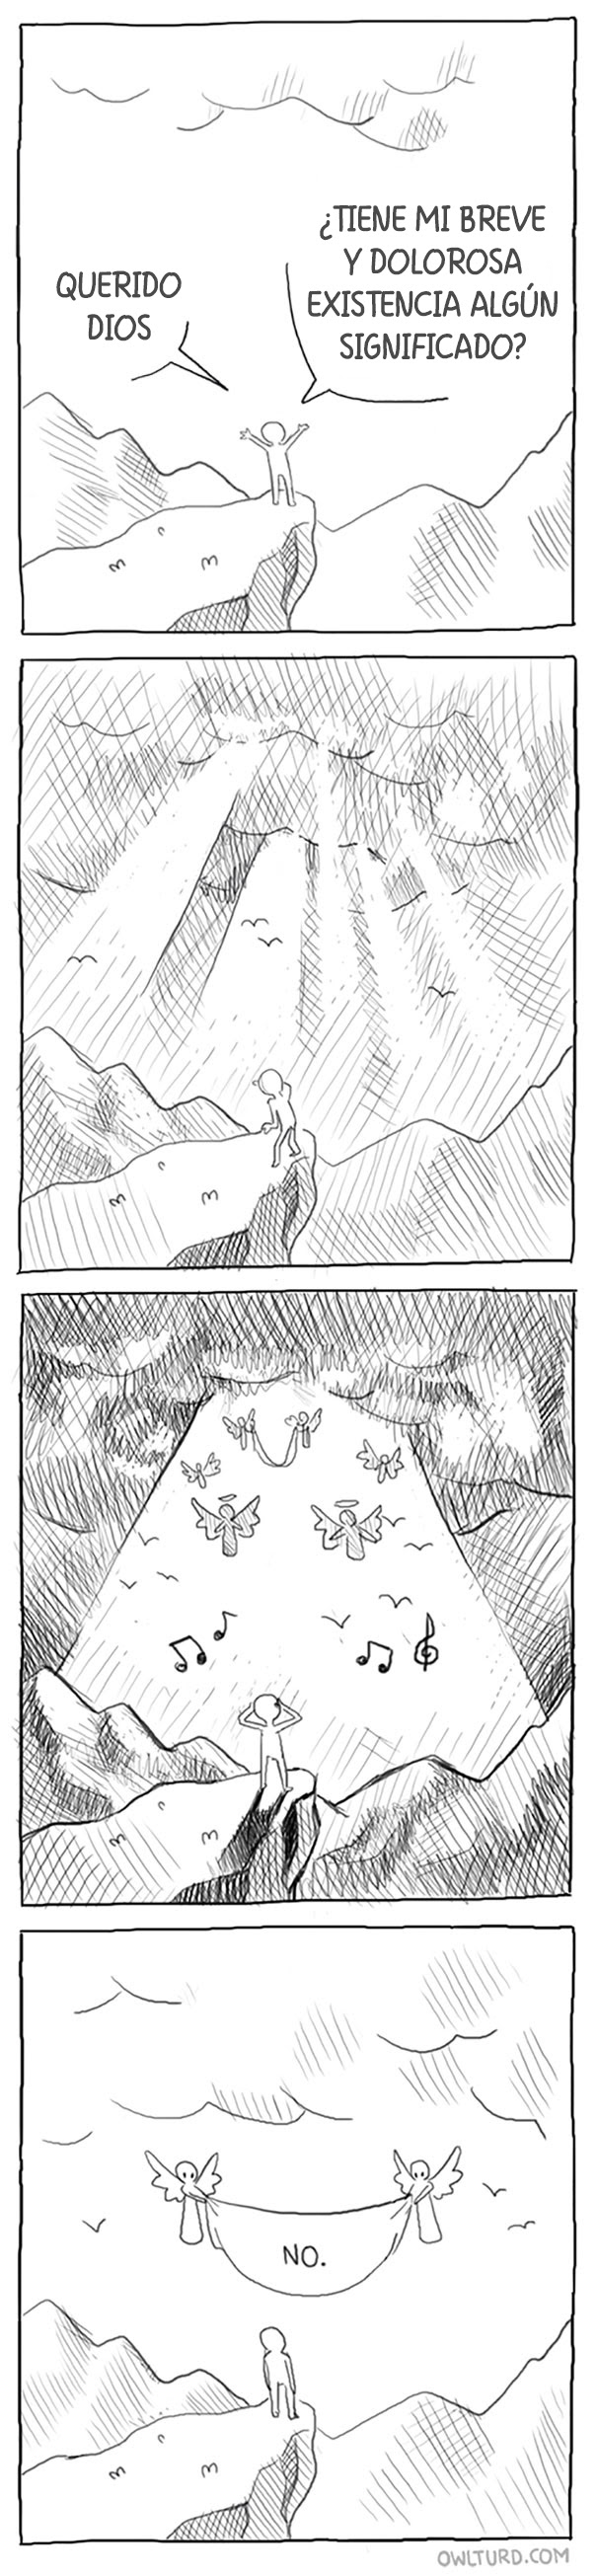 comics-owl-turd-shenanigansen-2-6